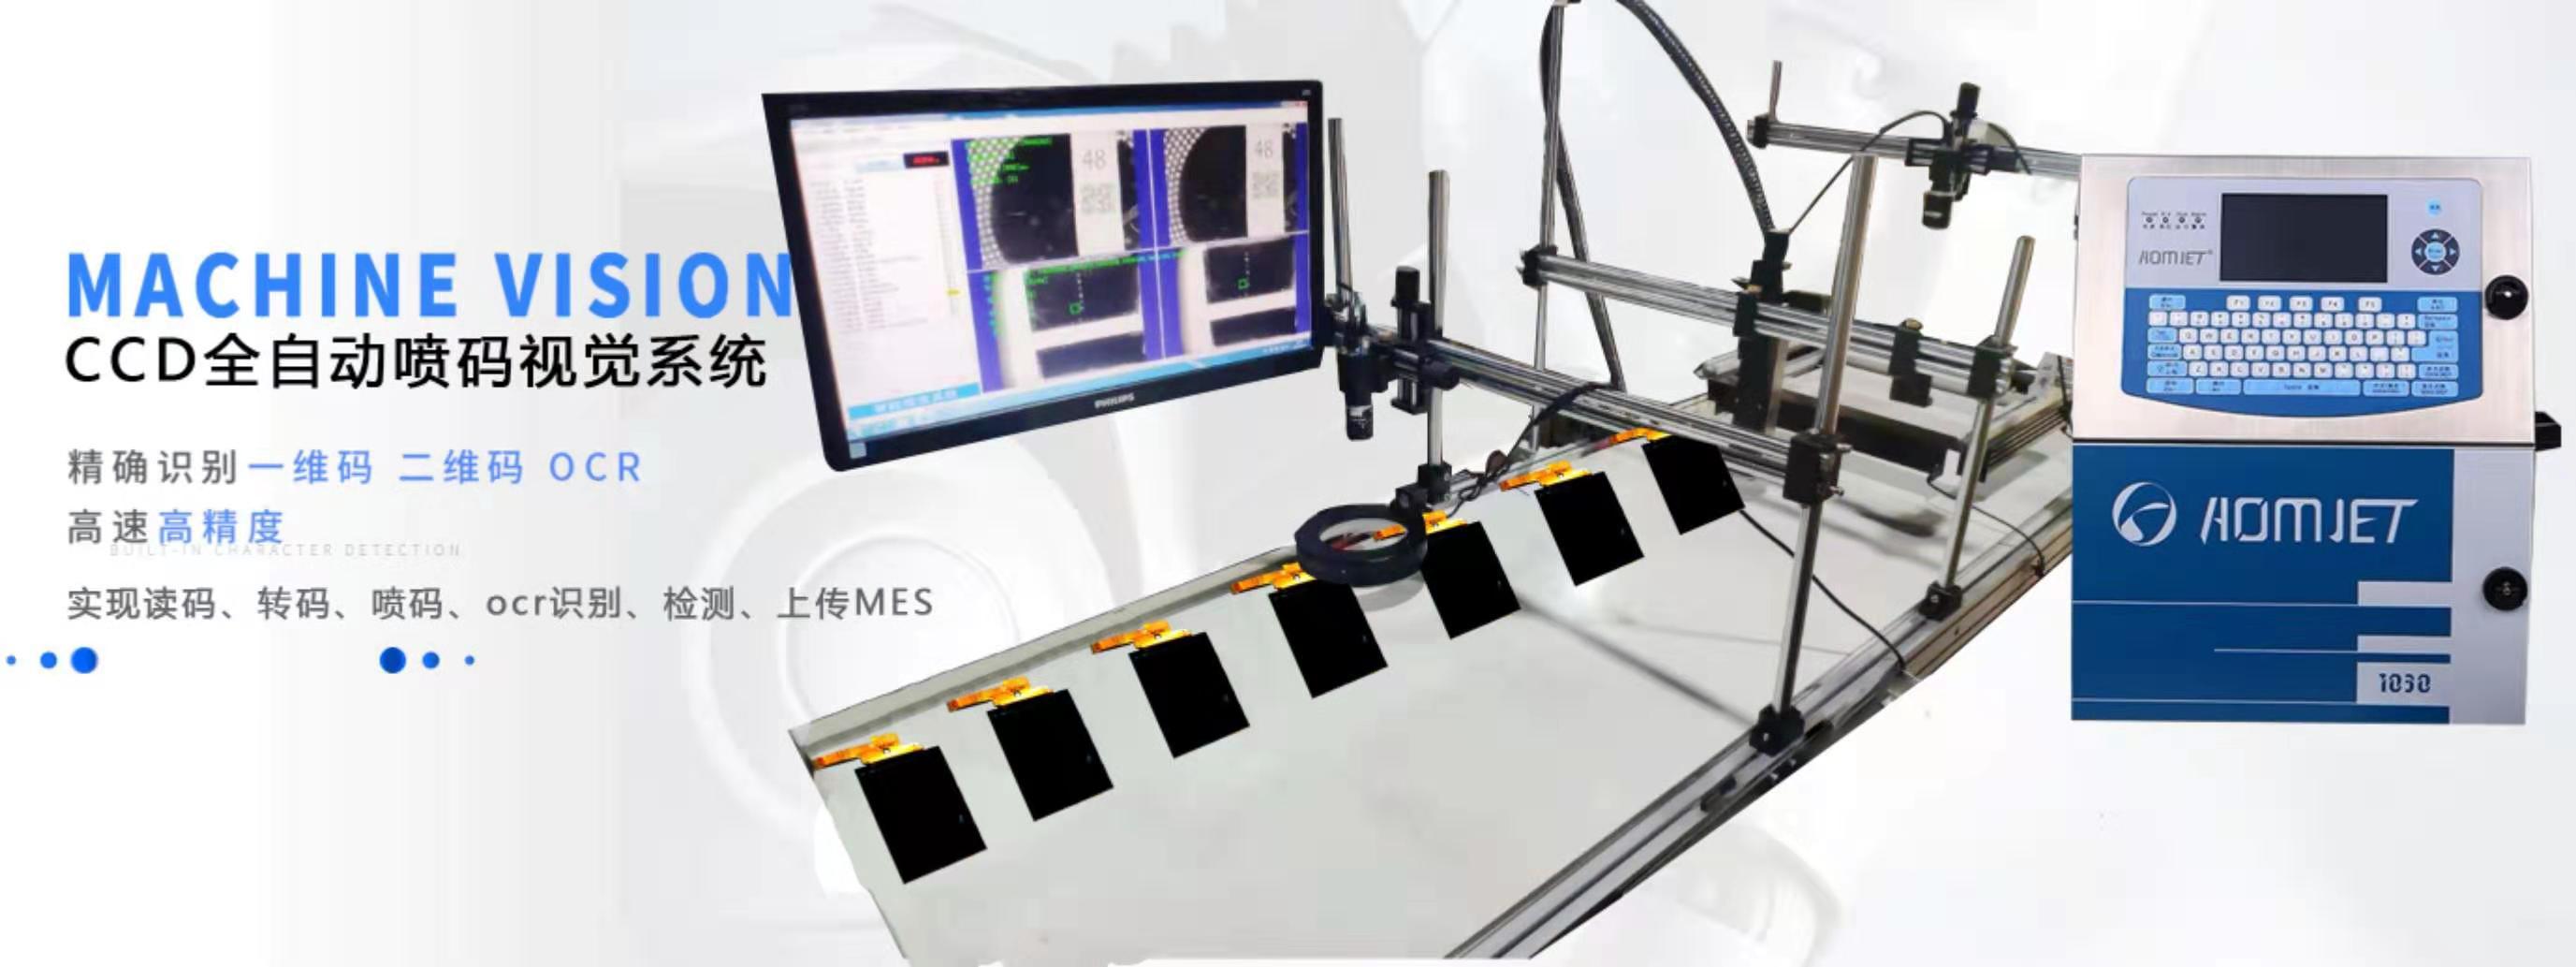 CCD全自动喷码设备视觉系统